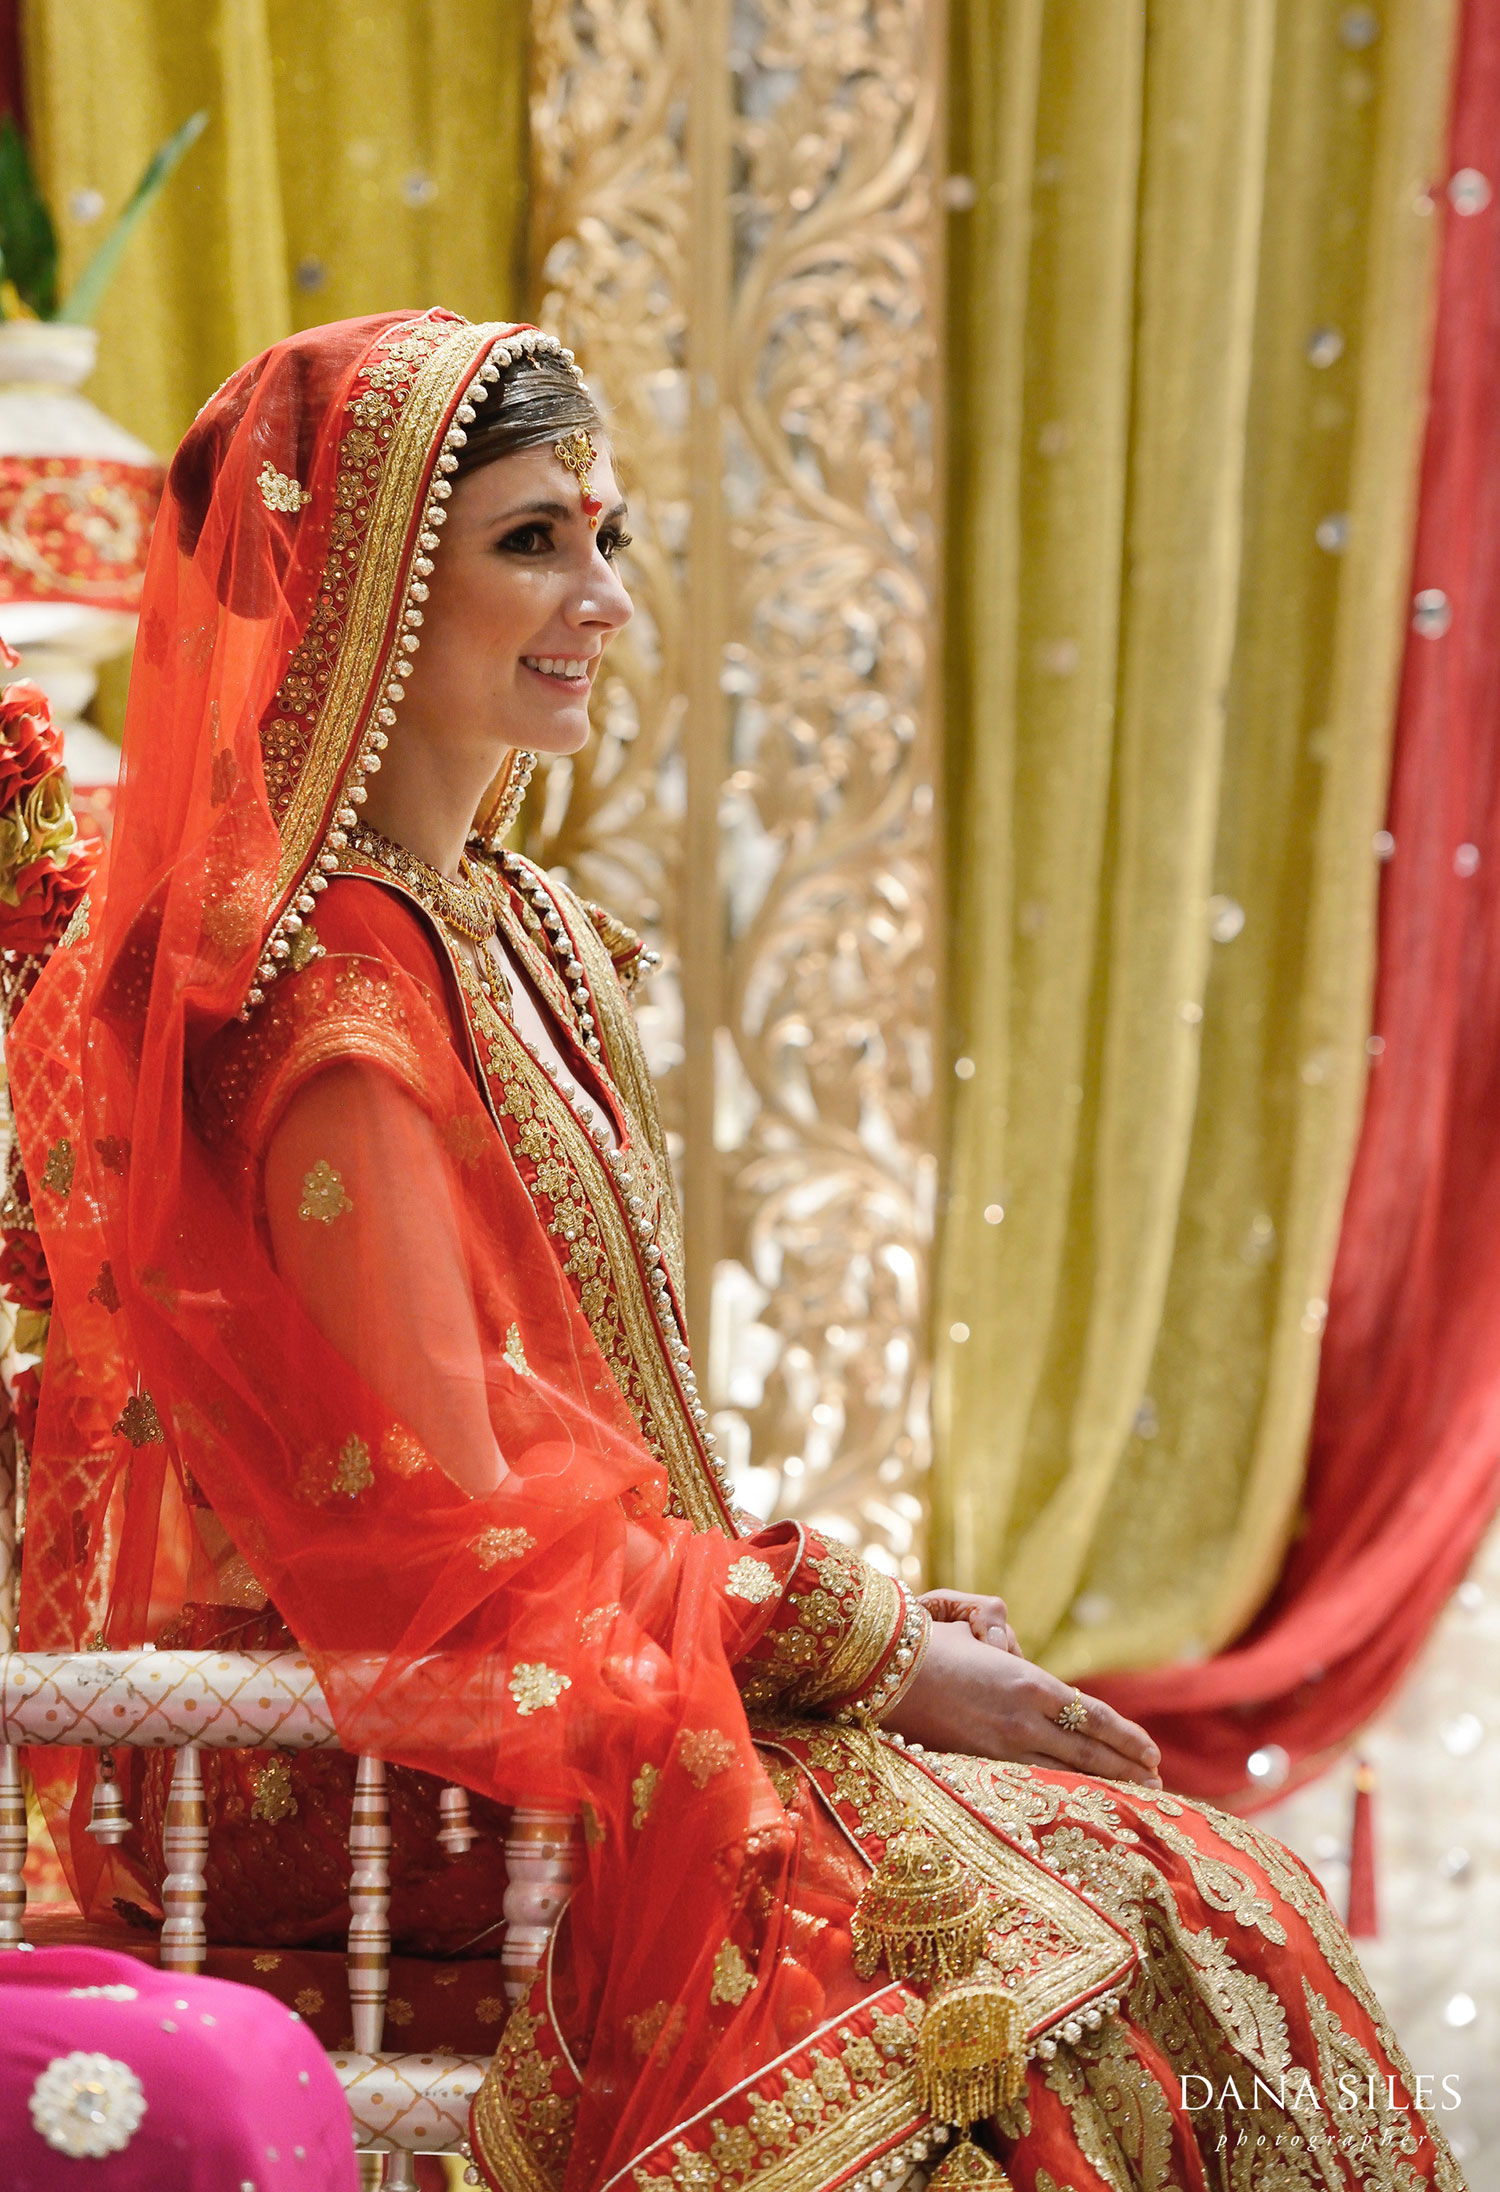 19_Asian-Chinese-Korean-Indonesian-Cambodian-Indian-Wedding-Photography-Copyright-Dana-Siles-Photographer